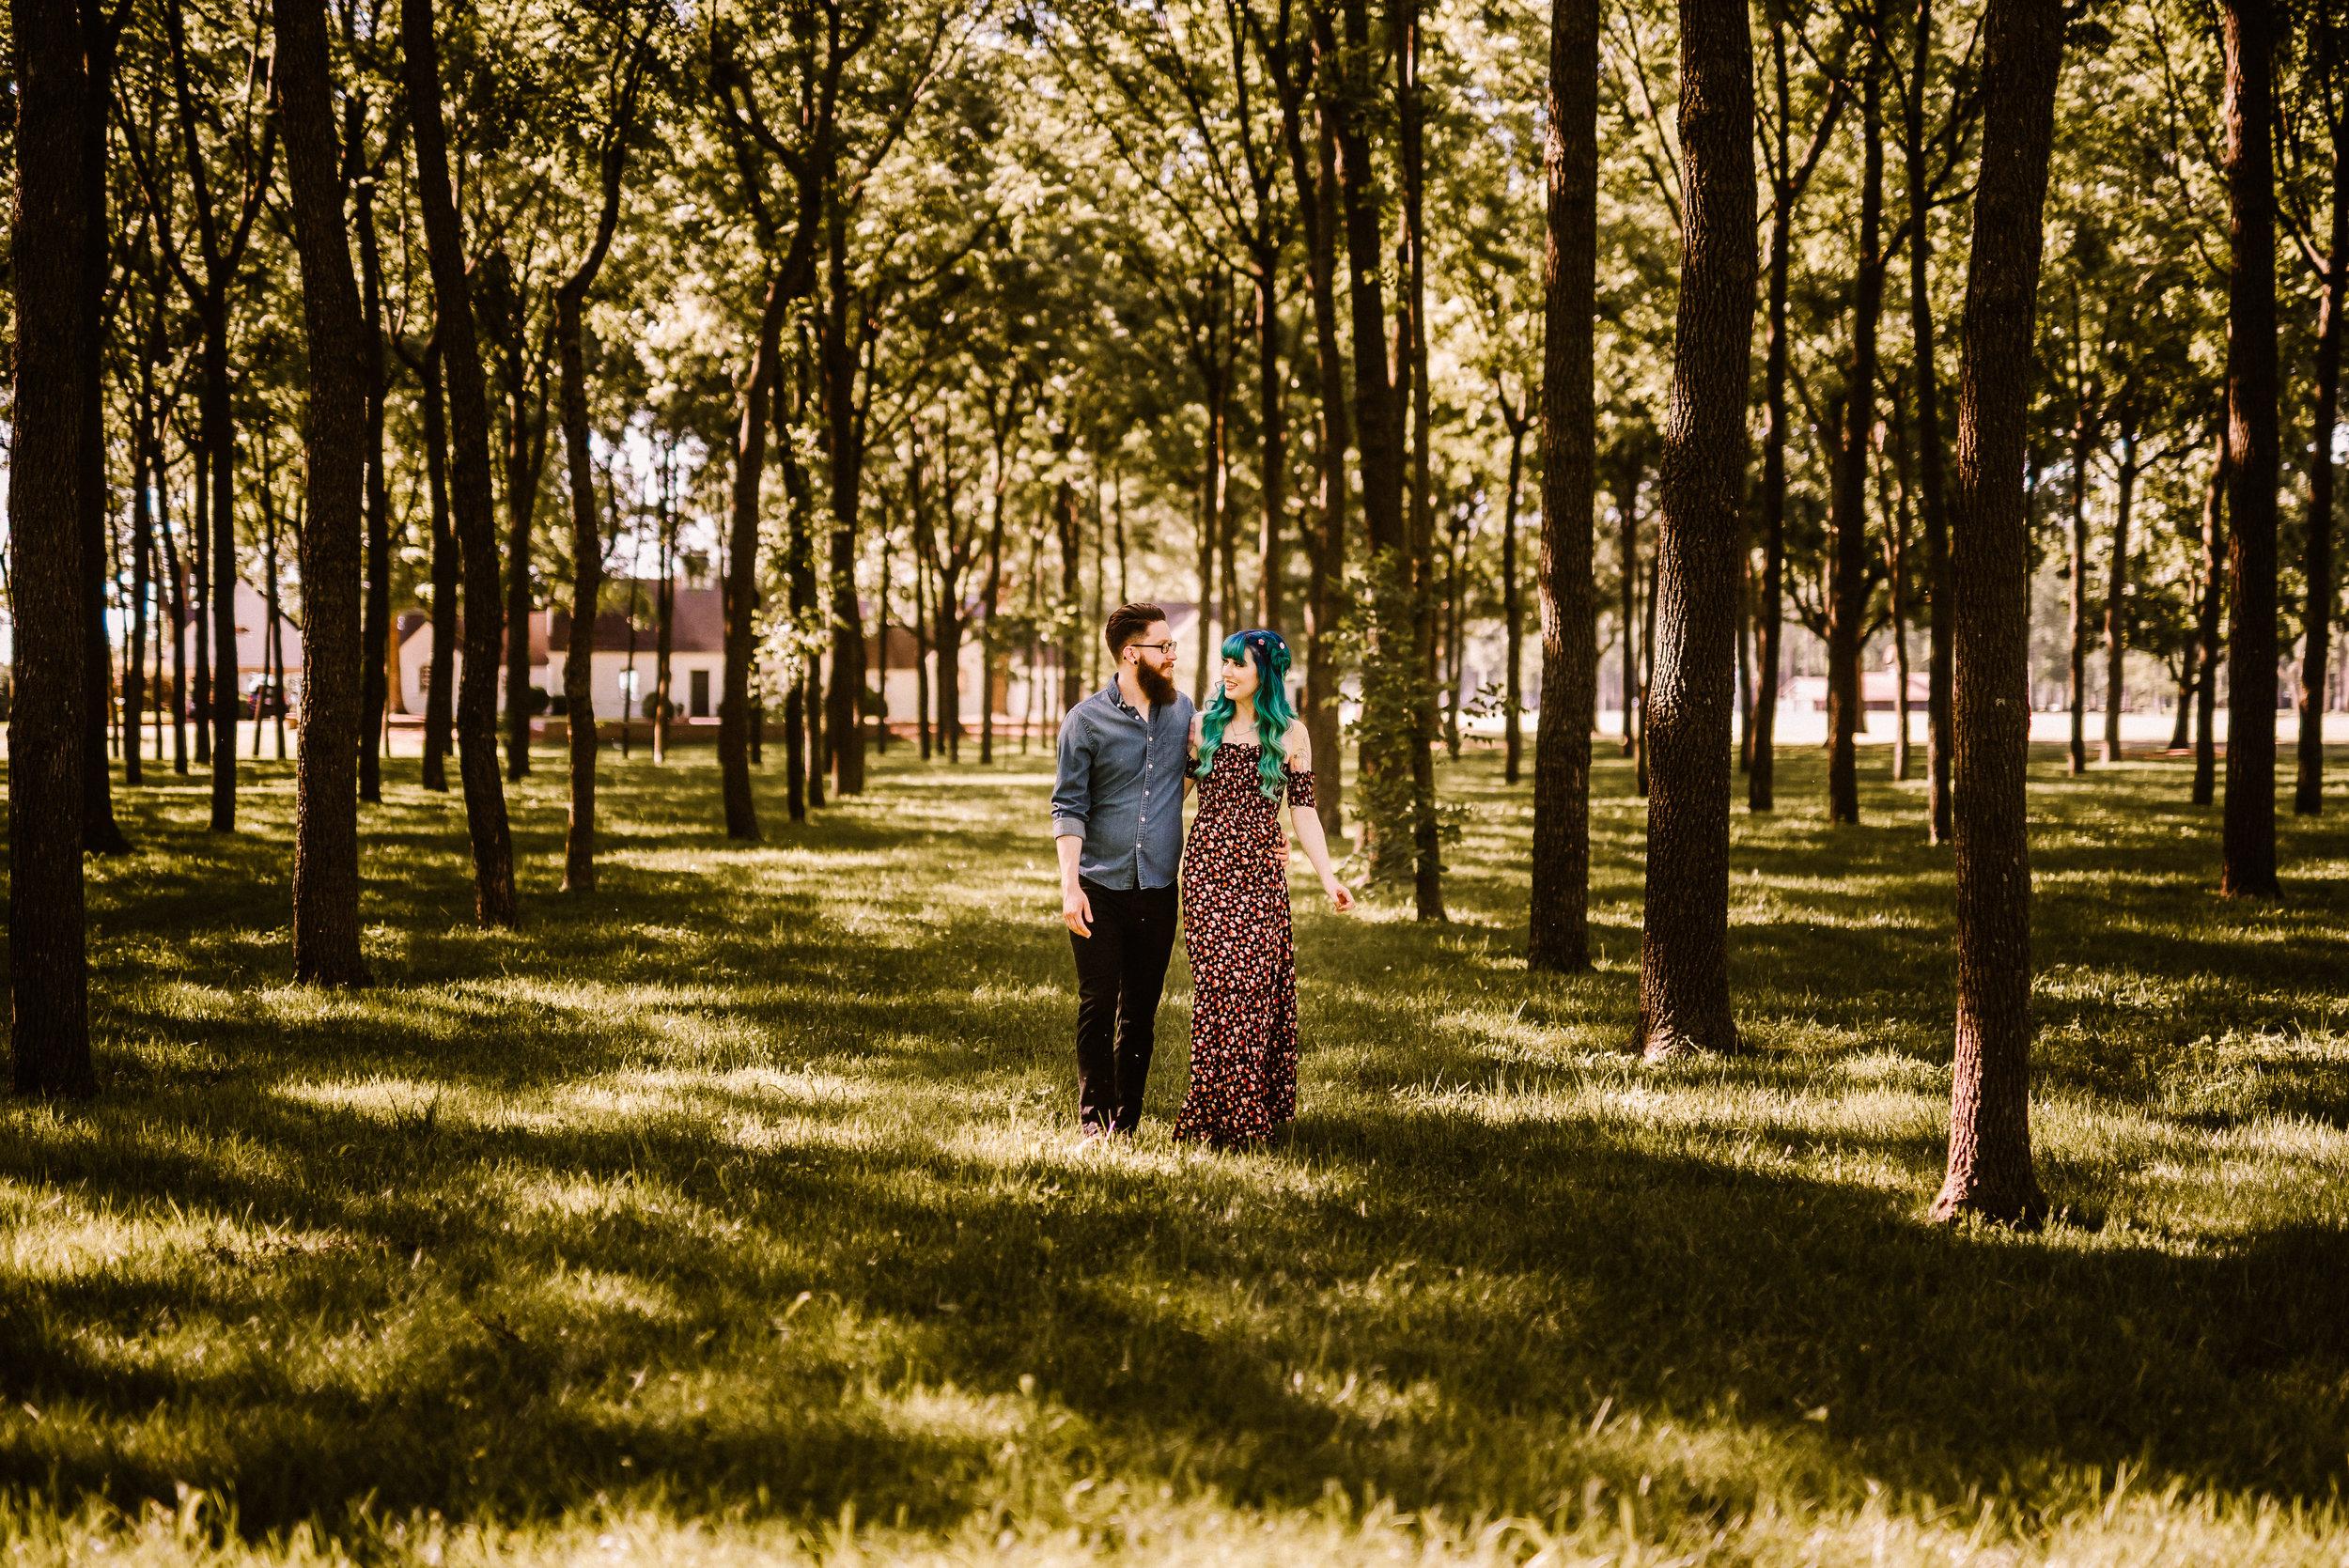 Kelly & Matt_Engagement Session_Wilson Arkansas_Ashley Benham Photography-20.jpg